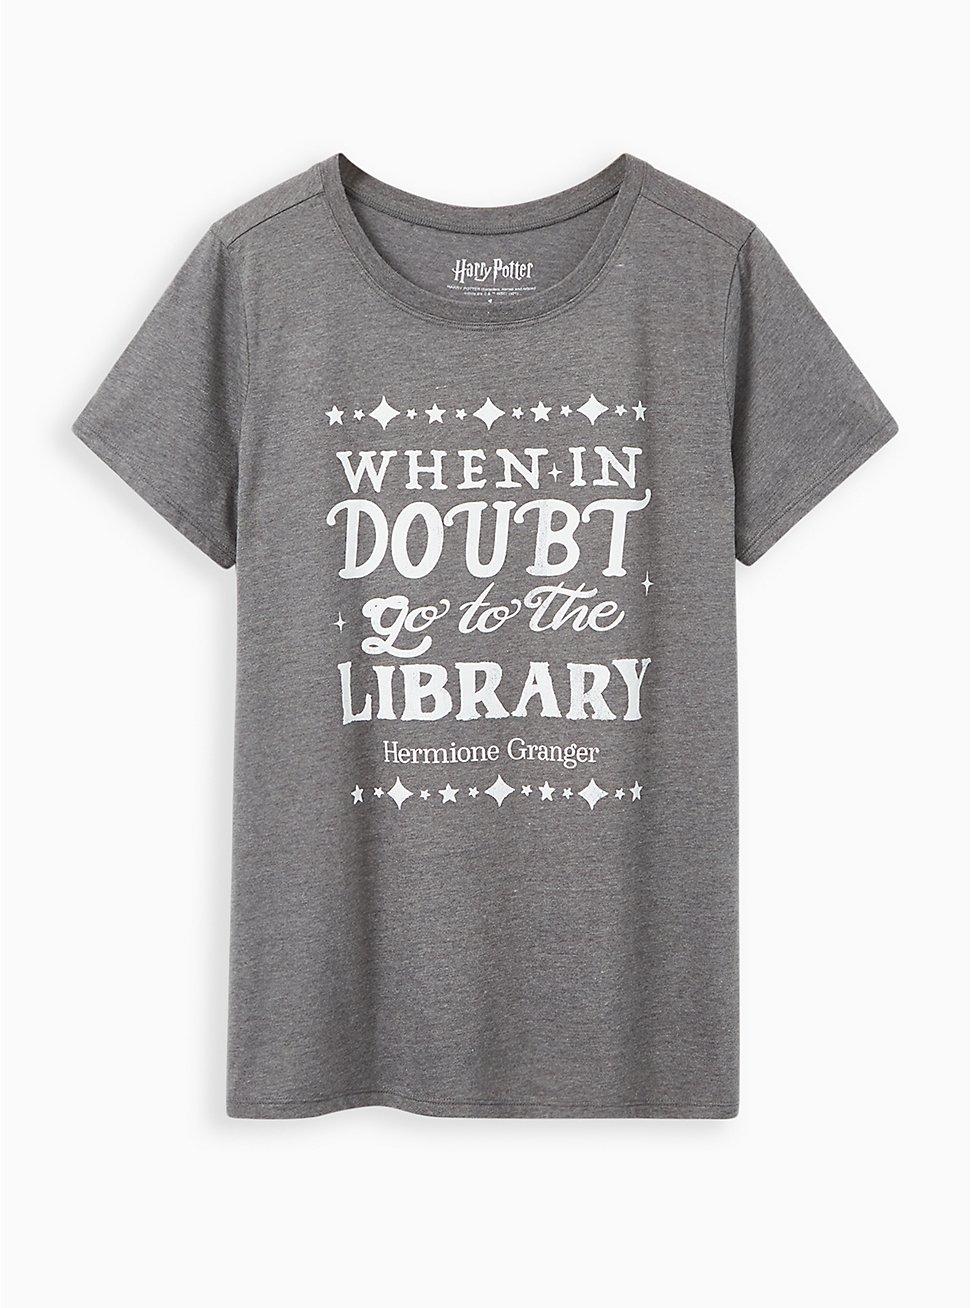 Slim Fit Crew Tee - Go To The Library Grey, MEDIUM HEATHER GREY, hi-res